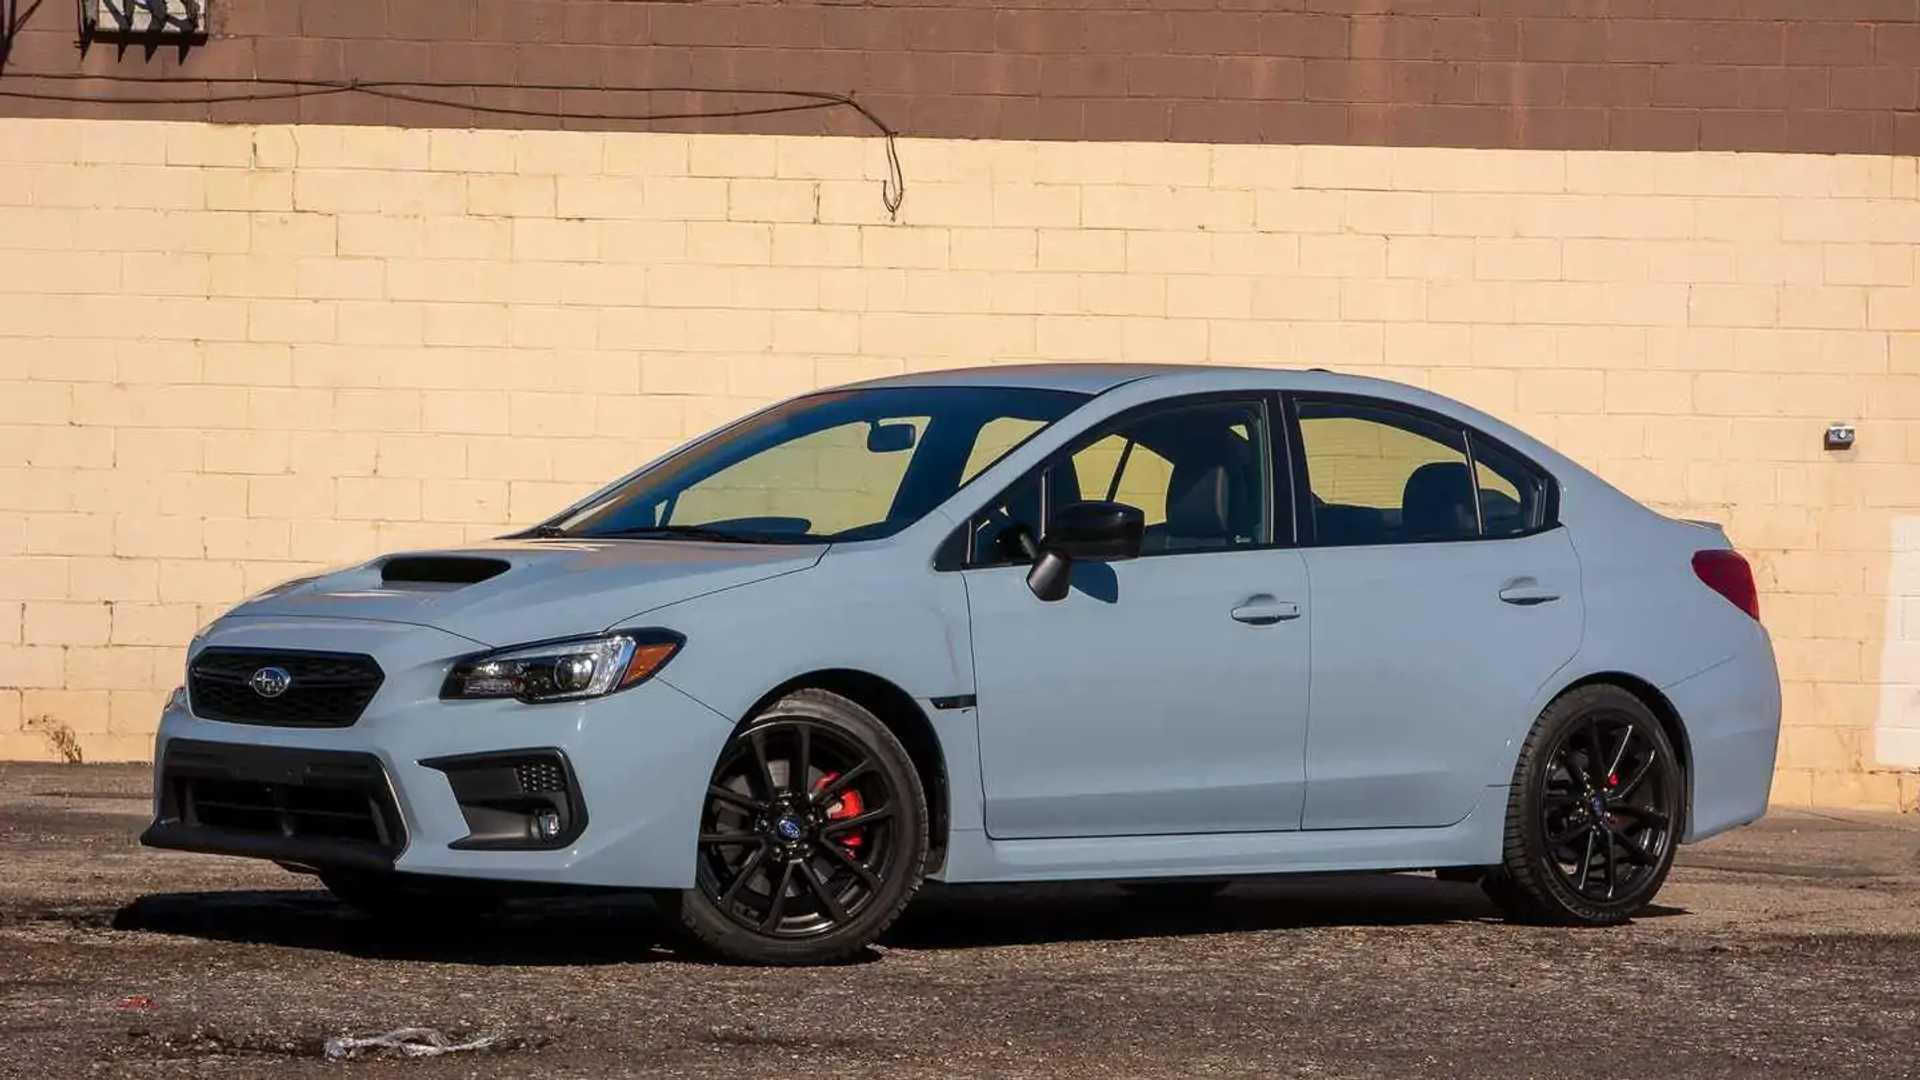 2019 Subaru WRX Series Gray: Pros And Cons